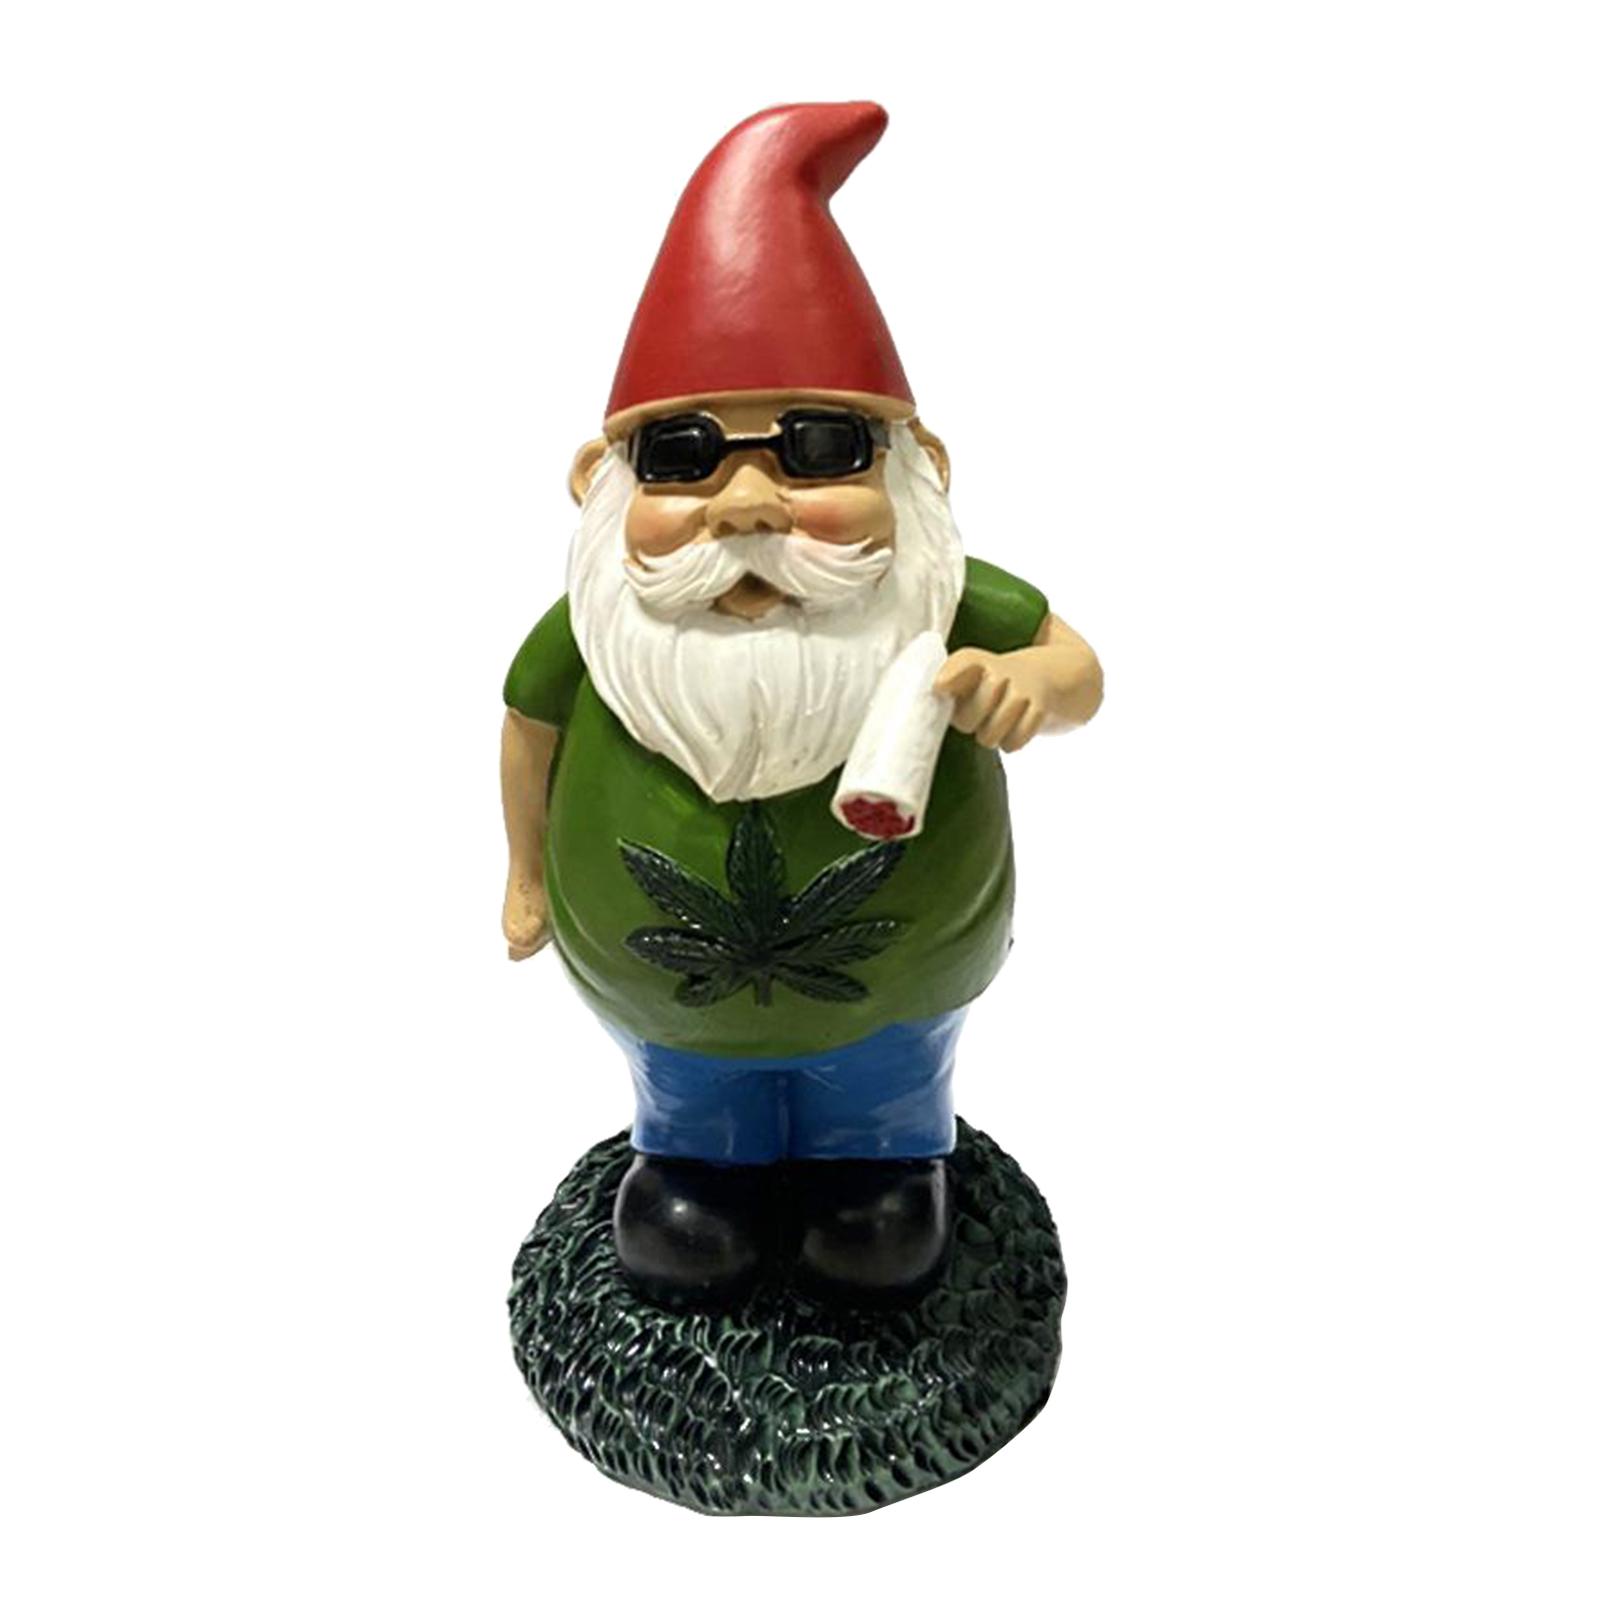 thumbnail 36 - Funny Resin Naughty Garden Gnome Statue Ornaments Outdoor Villa Home Figurines